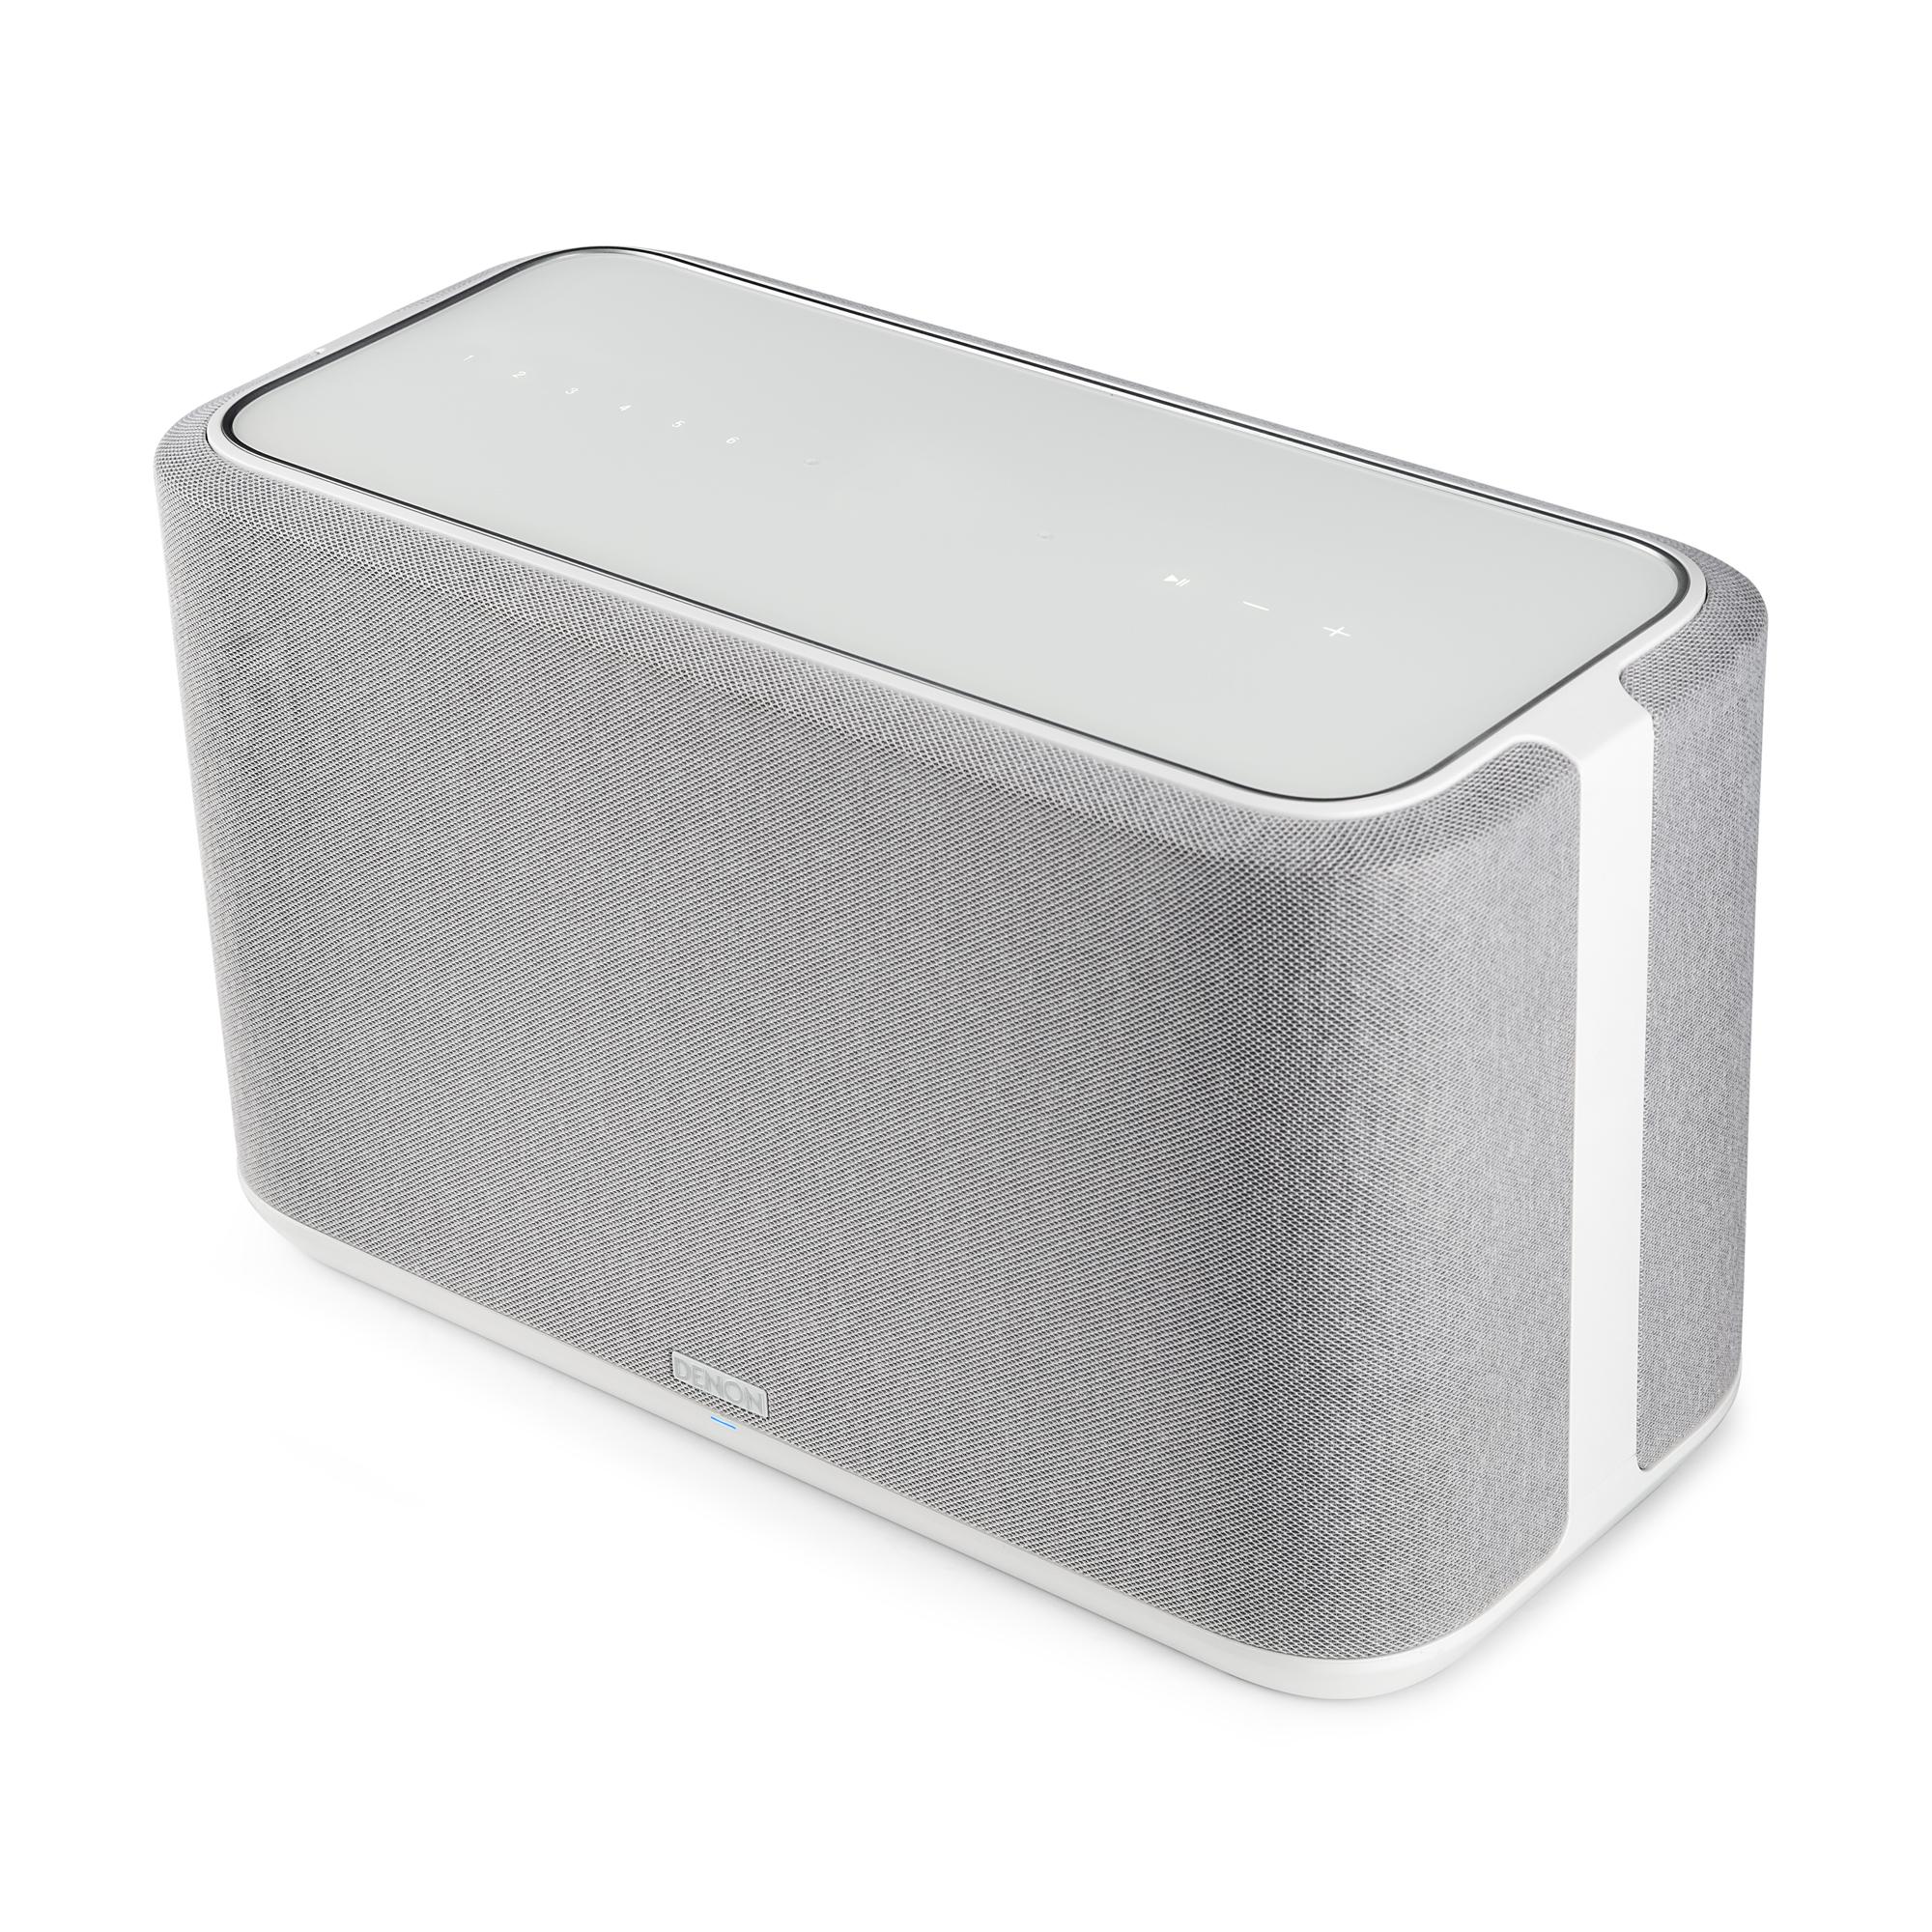 Denon Home 350 weiss Stück Wireless-Lautsprecher 101225